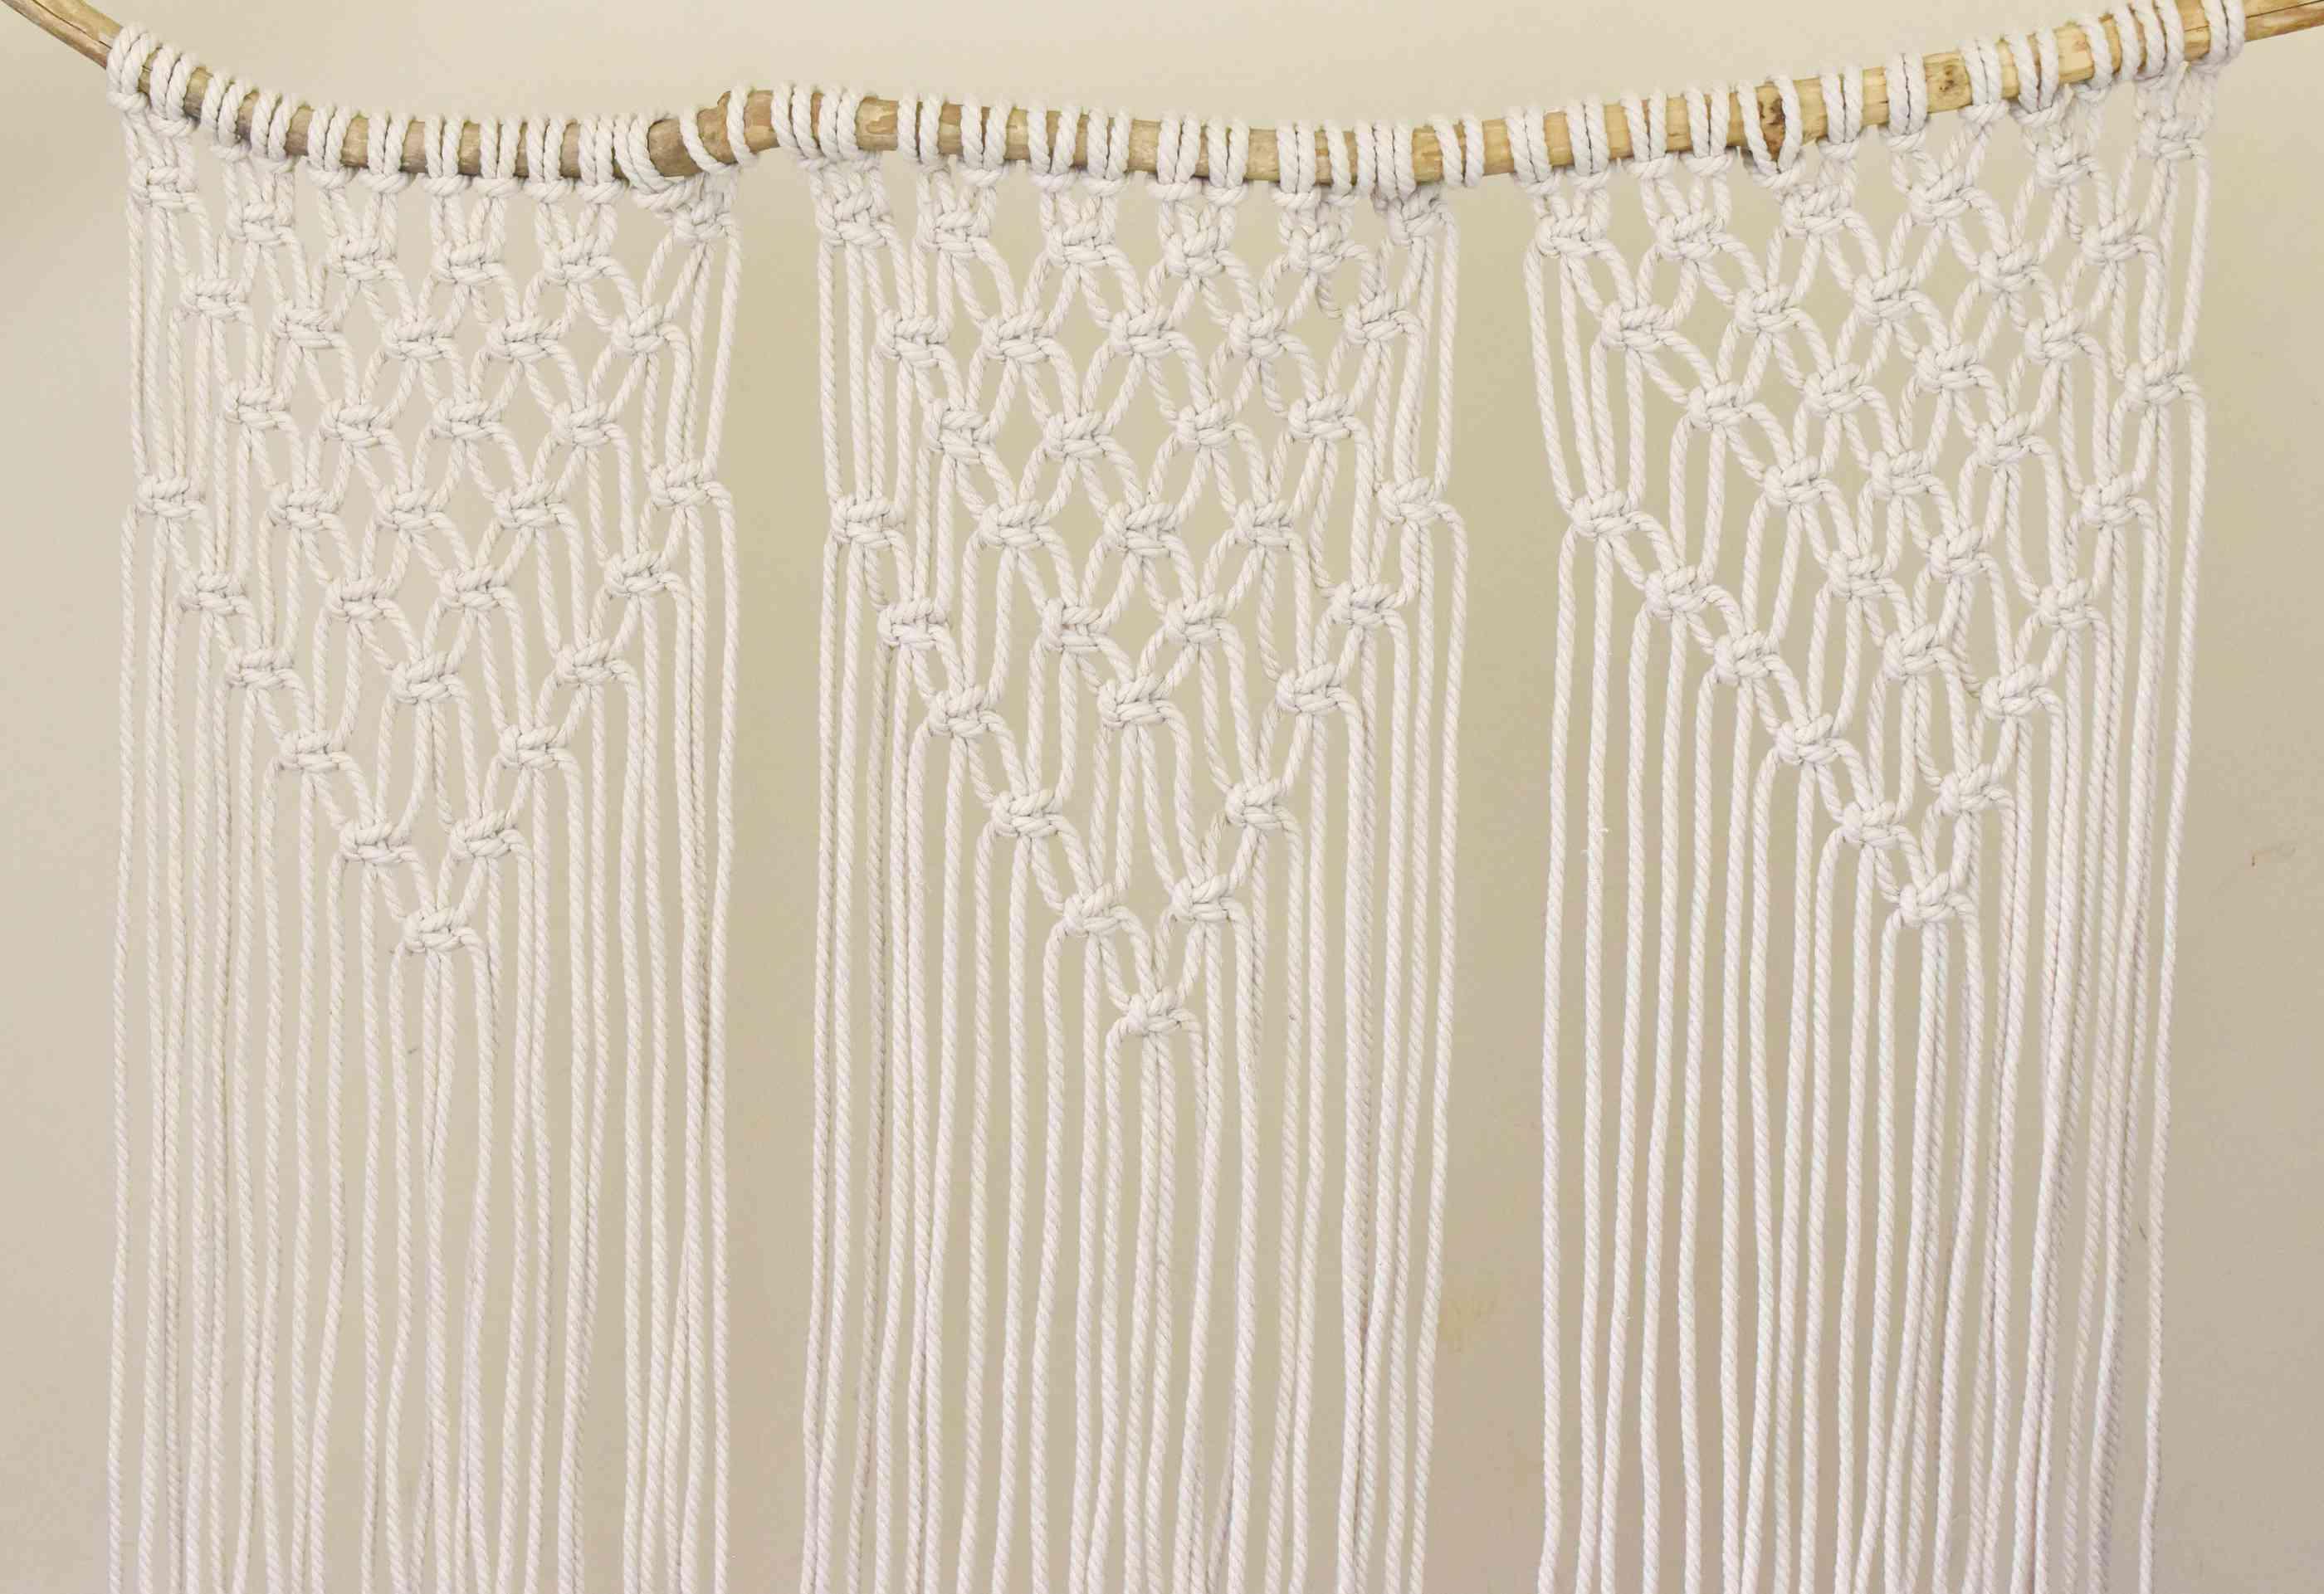 DIY Macrame Curtain on a Branch